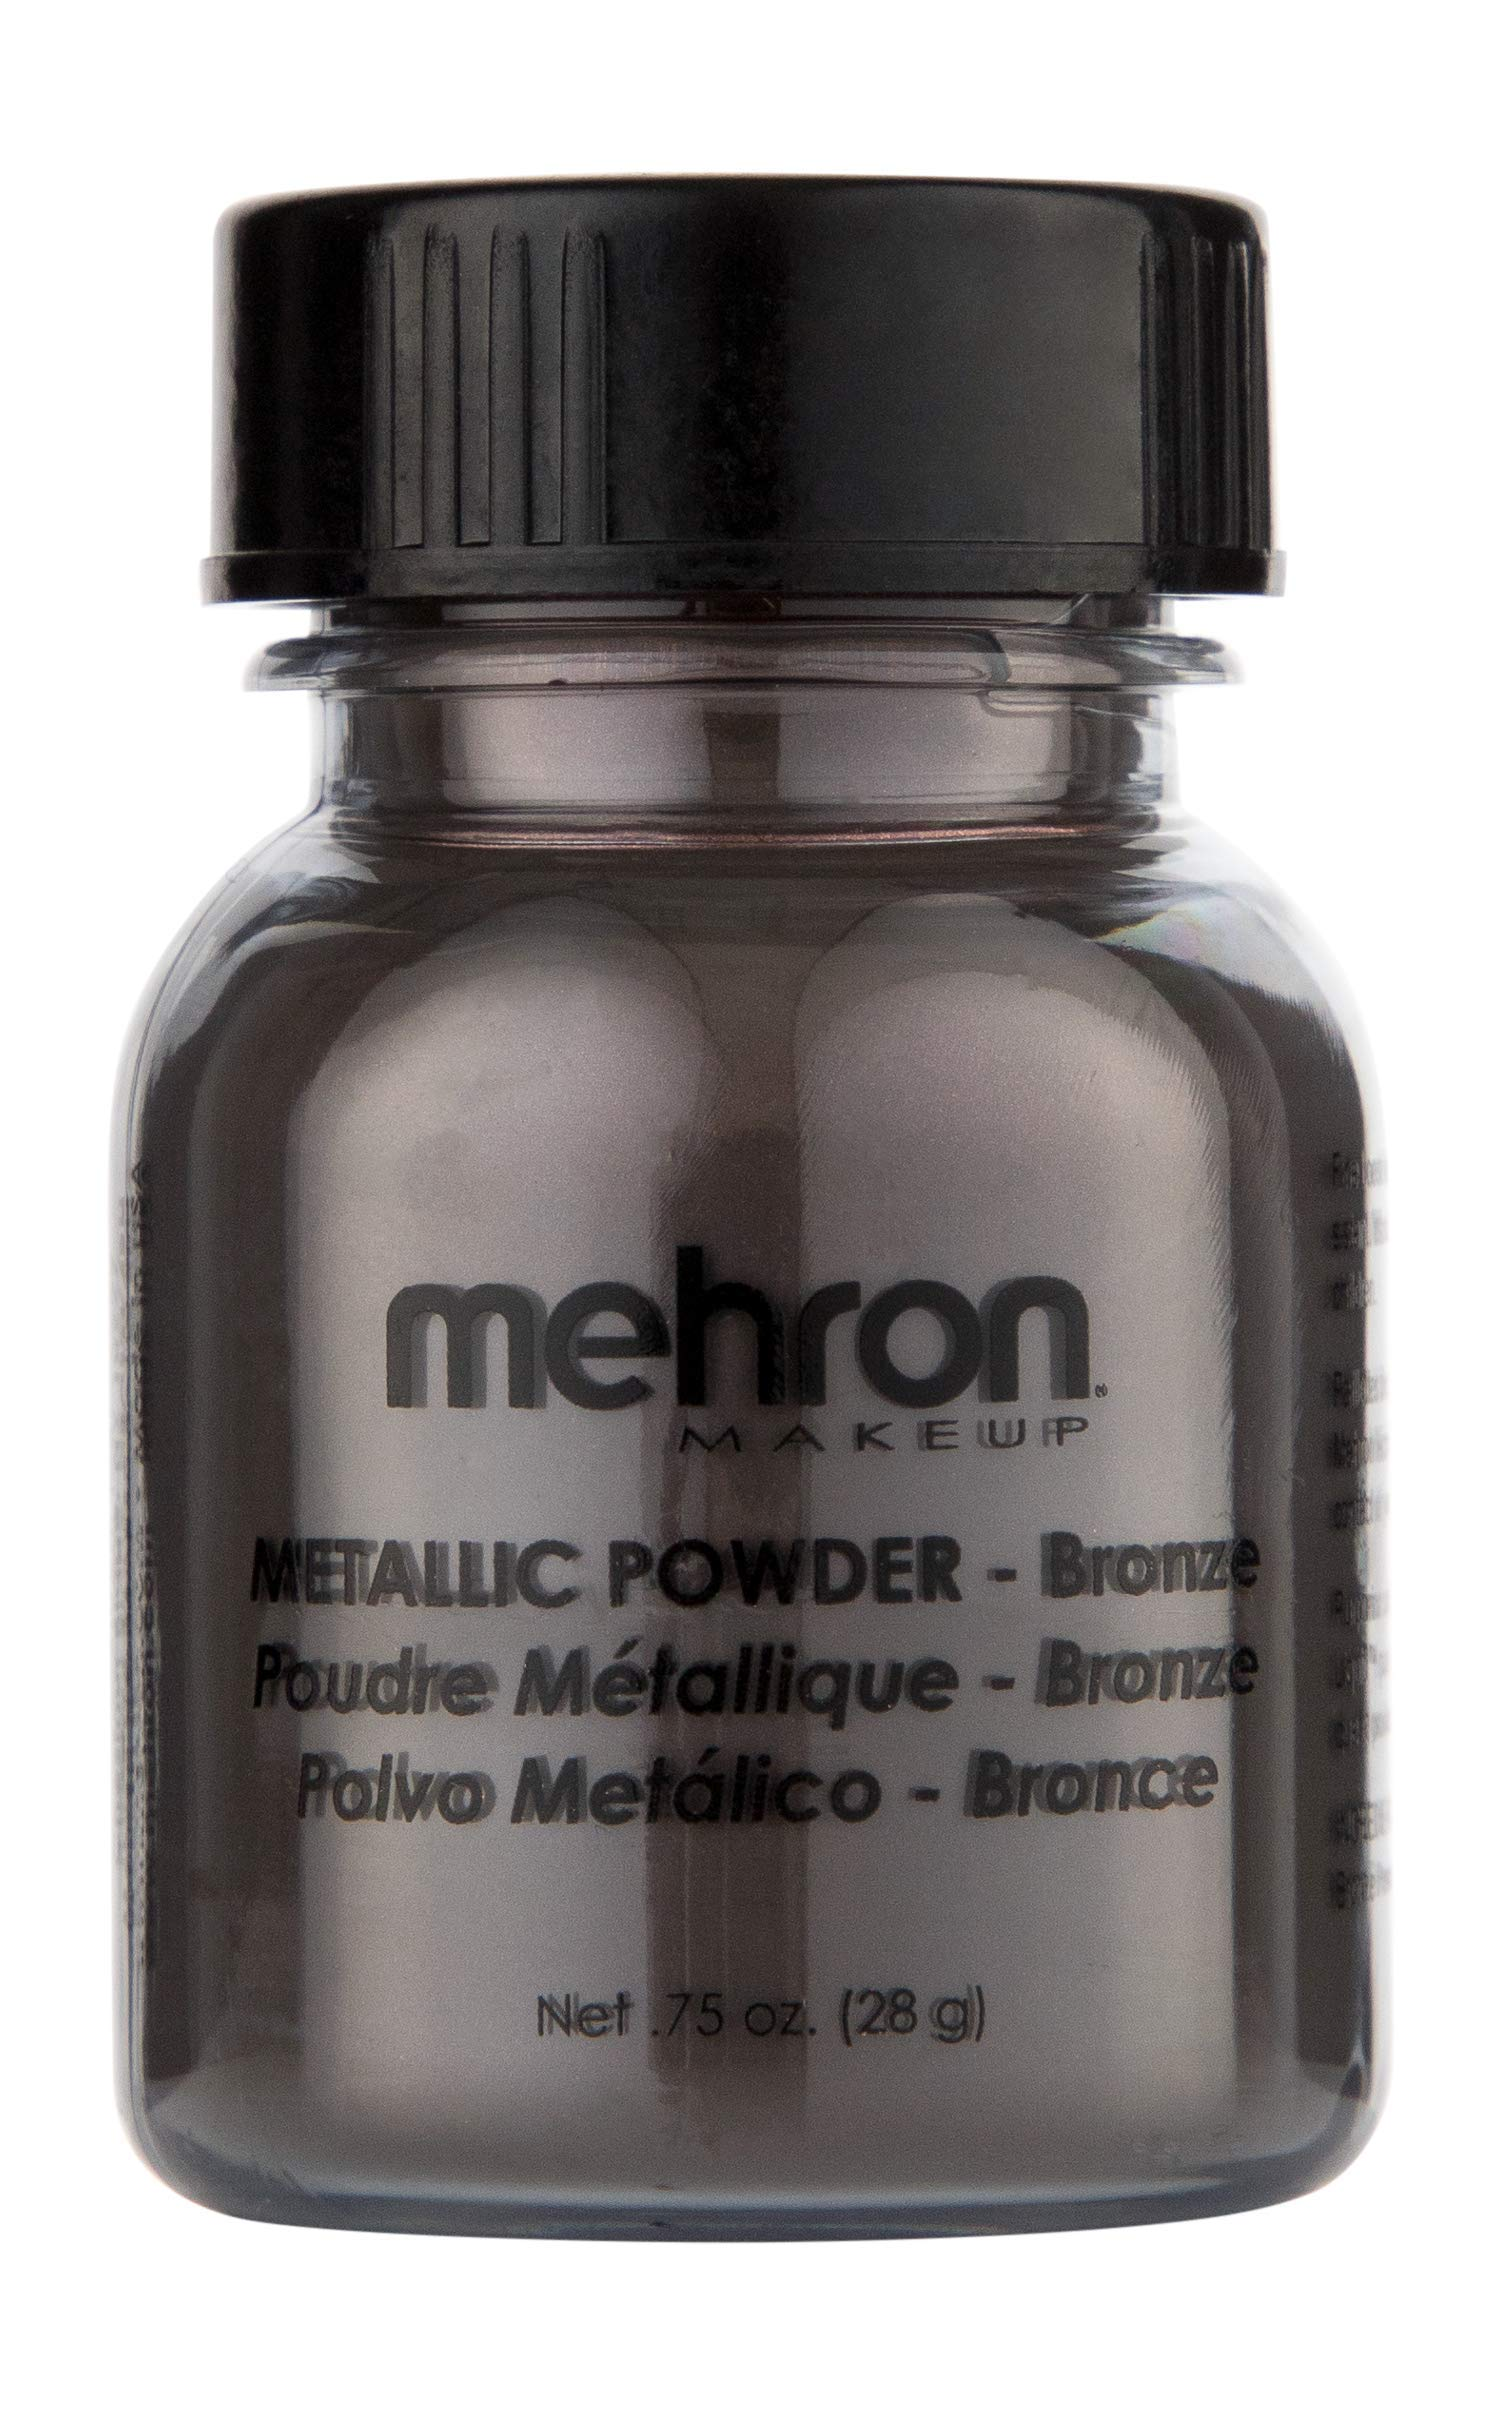 Mehron Makeup Metallic Powder (.75 oz) (BRONZE)